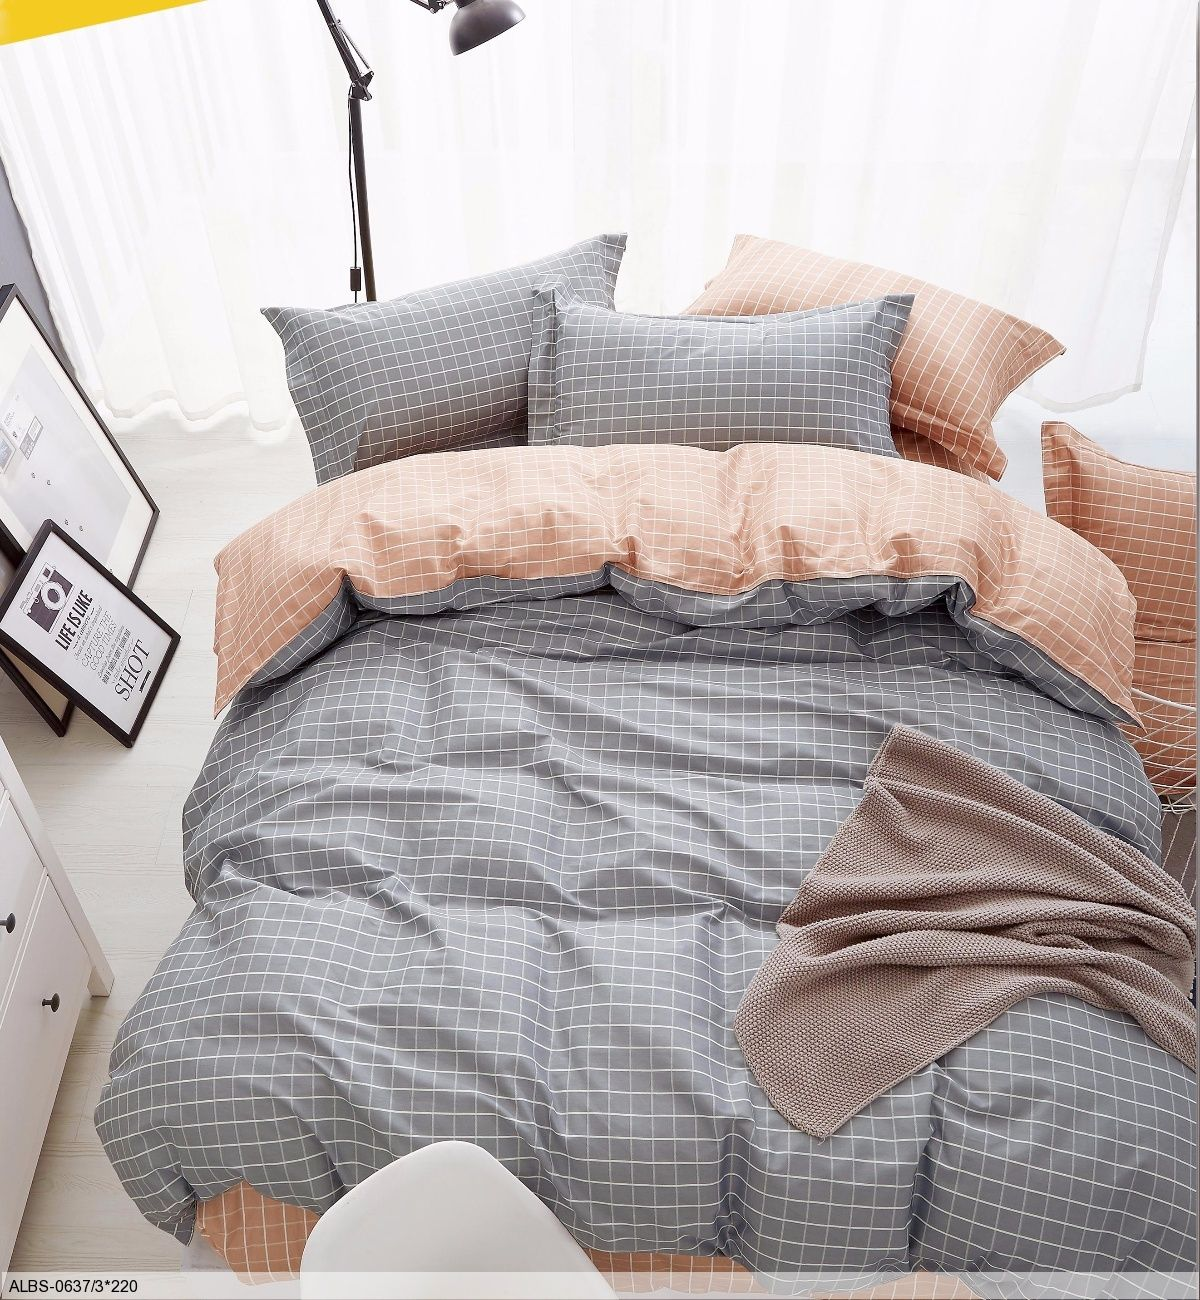 Galeria Zdjec Aukcji Allegro Posciel 200x220 Str 4 Galerie Allegro Pl Small Bedroom Bedroom Bedroom Design